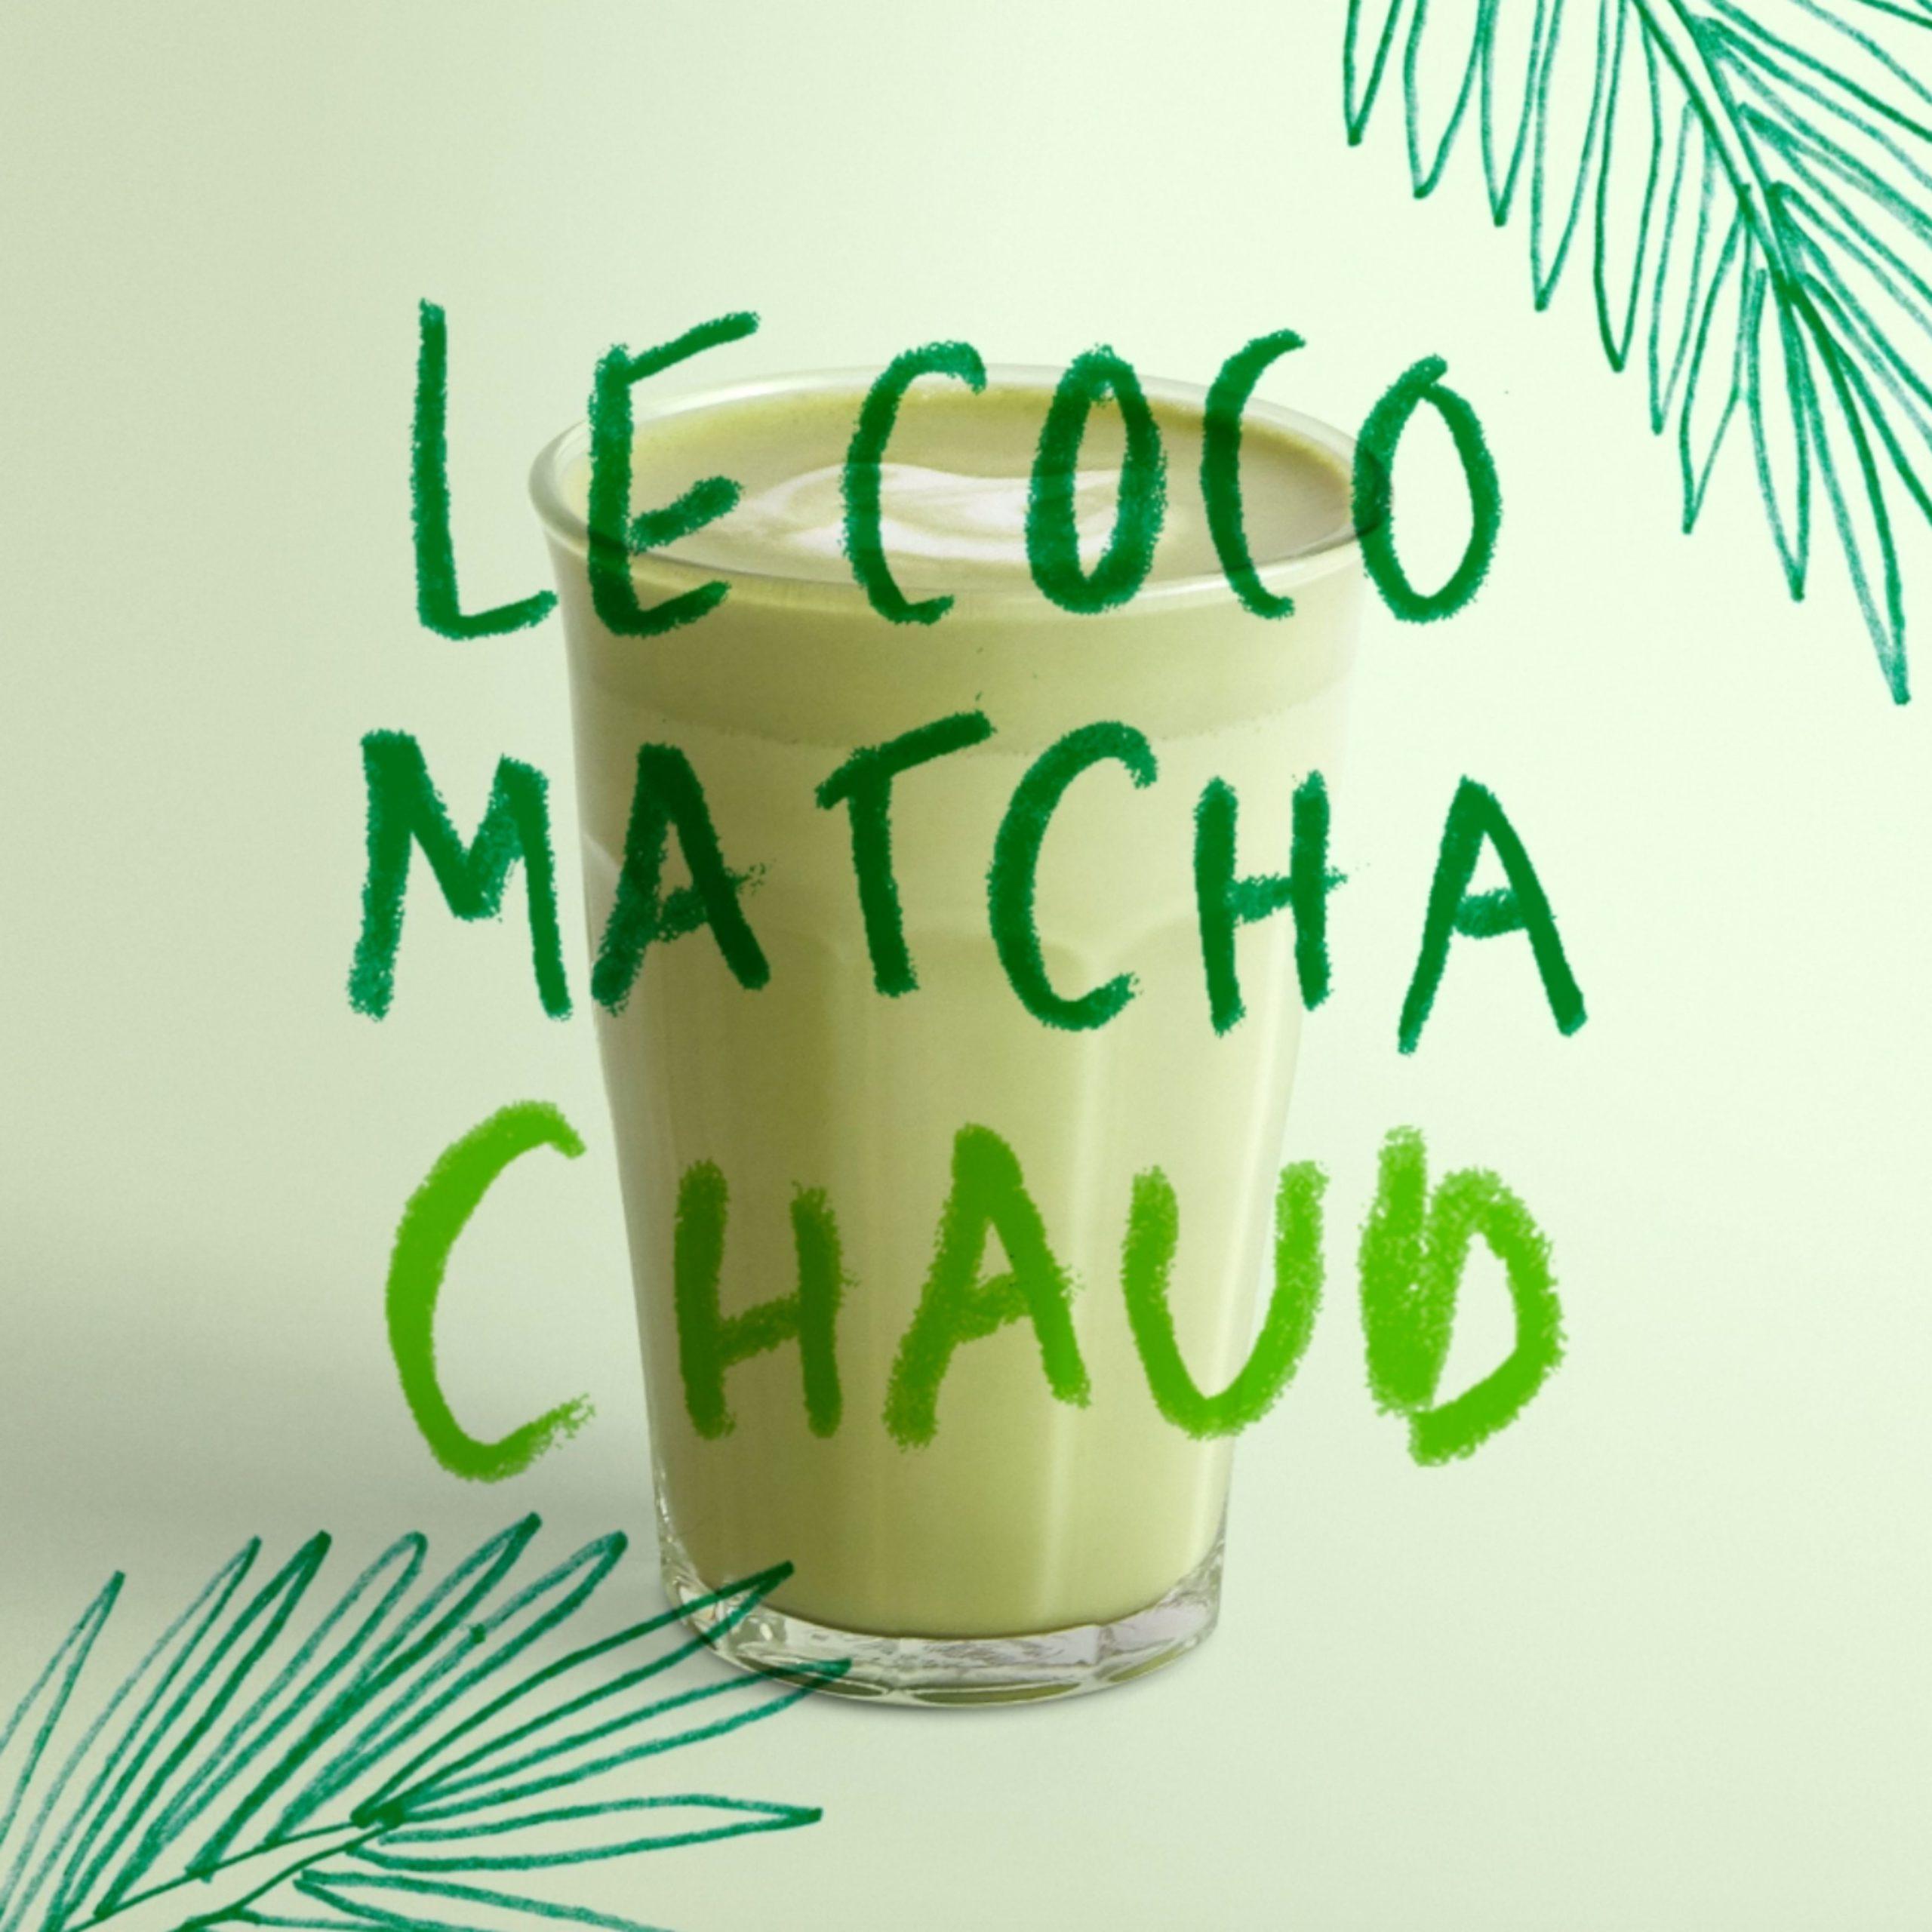 Le Coco Matcha chaud archi chaud